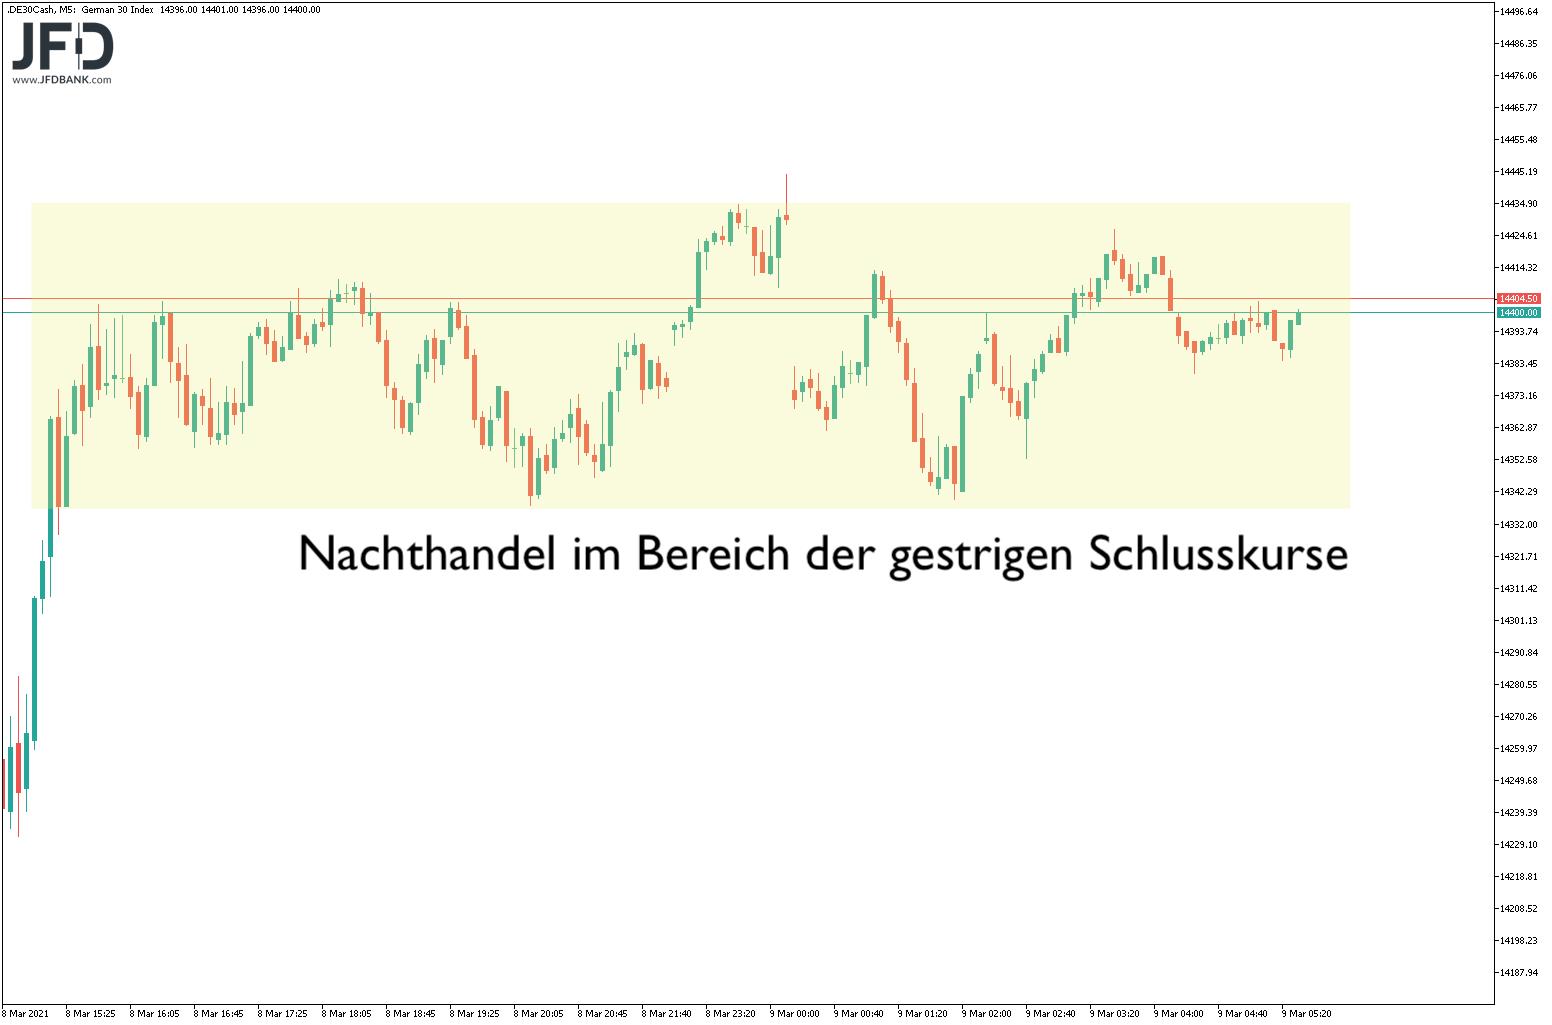 DAX-Rekordhoch-erzielt-halten-wir-das-Niveau-Kommentar-JFD-Bank-GodmodeTrader.de-6